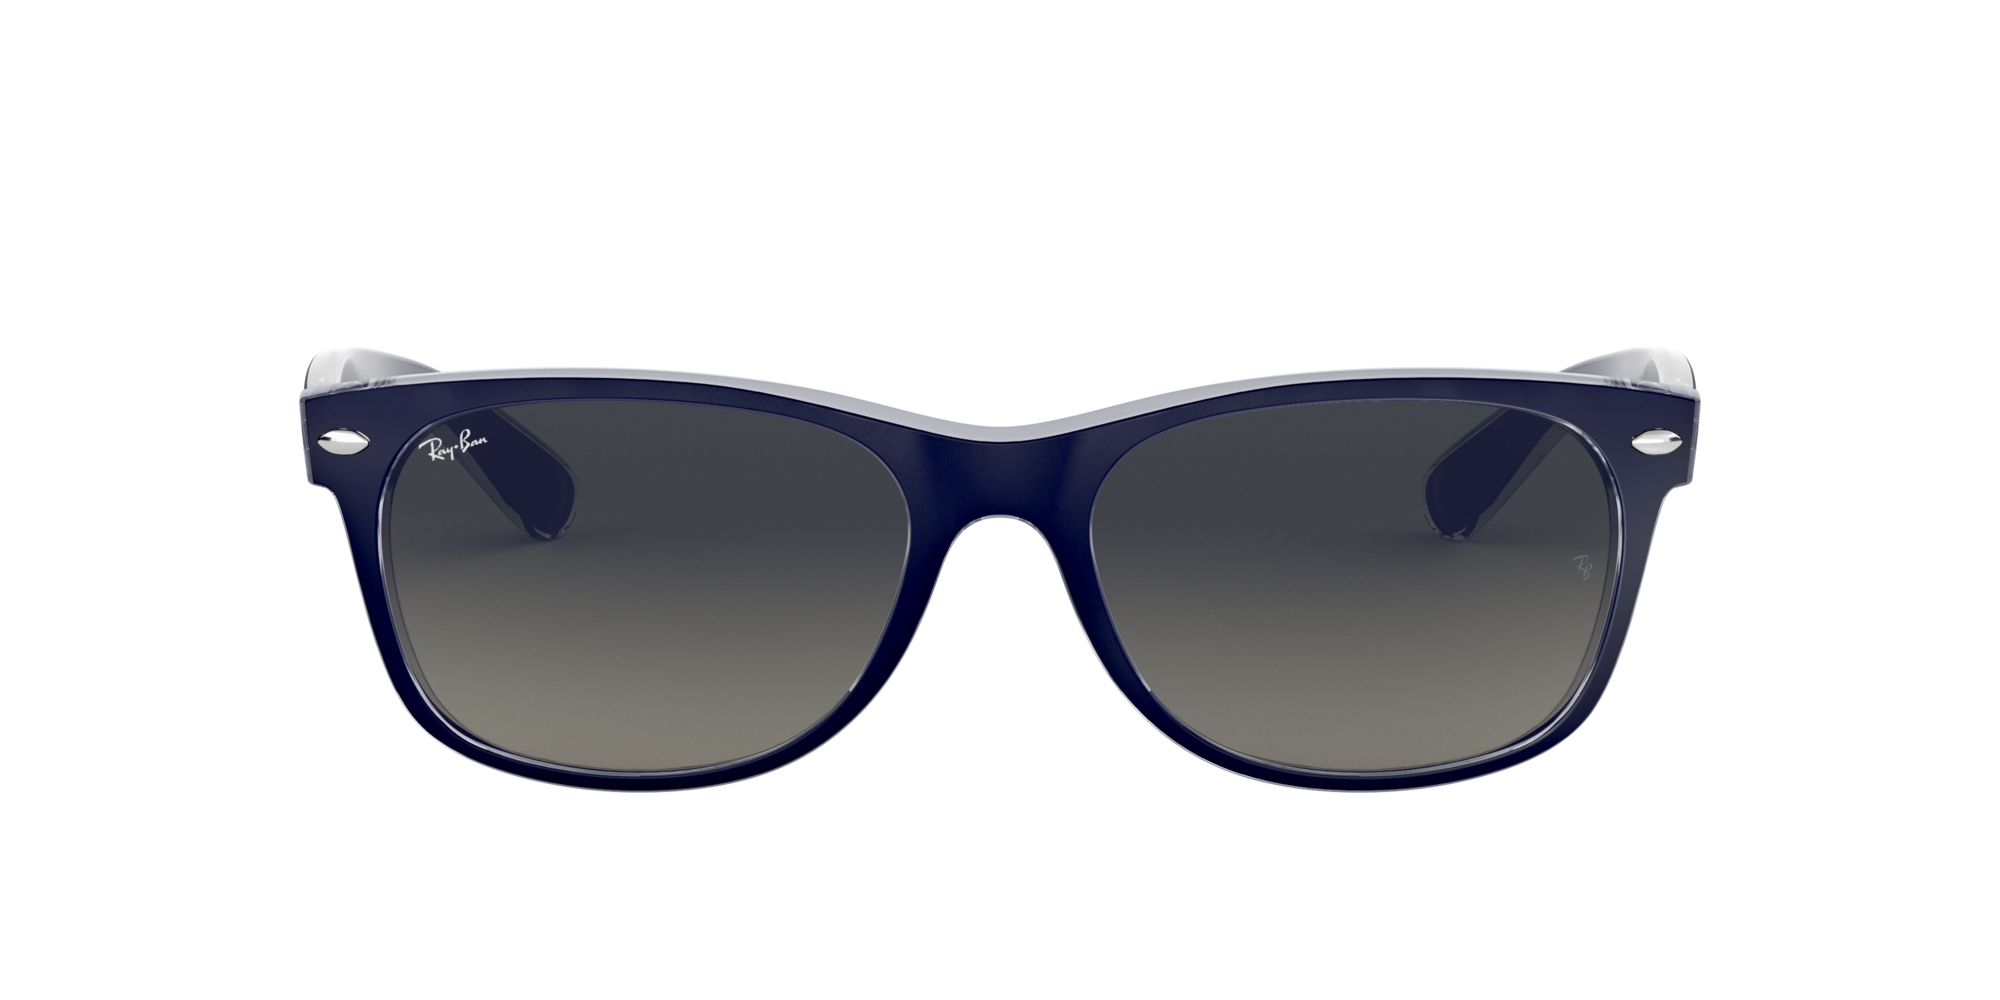 Image for RB2132 52 NEW WAYFARER from LensCrafters | Glasses, Prescription Glasses Online, Eyewear